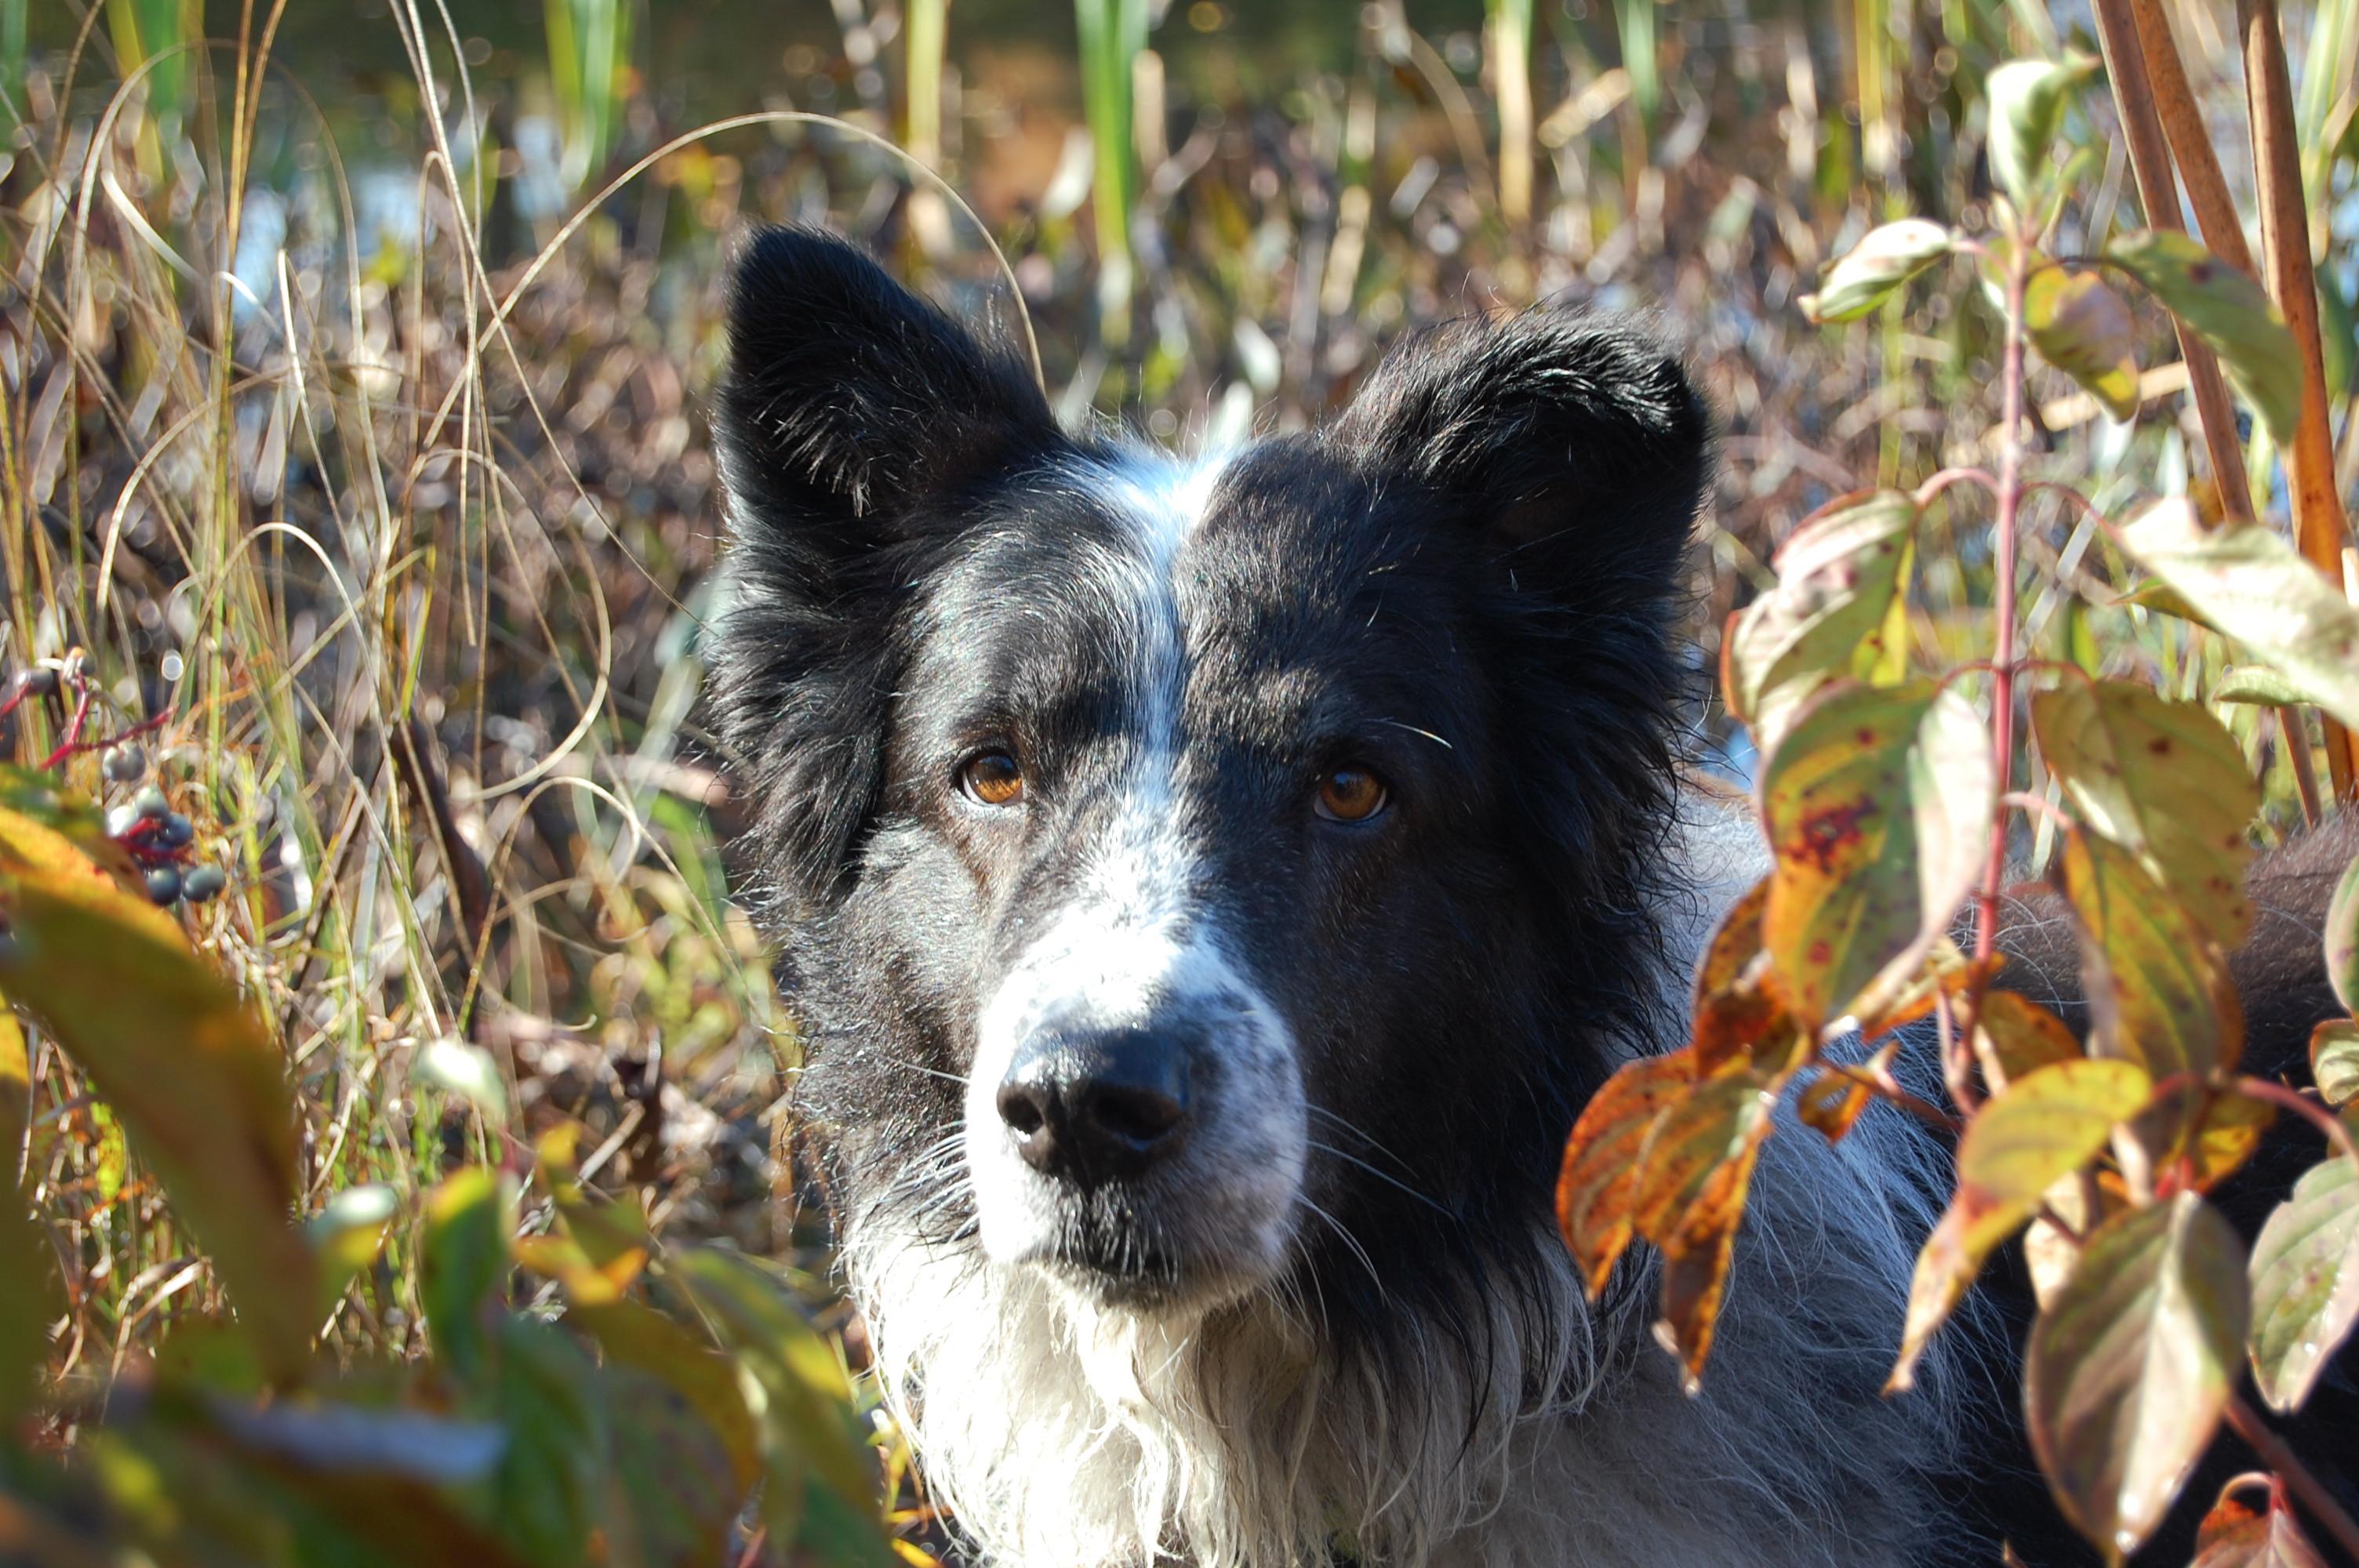 Old Time Farm Shepherd dog face wallpaper